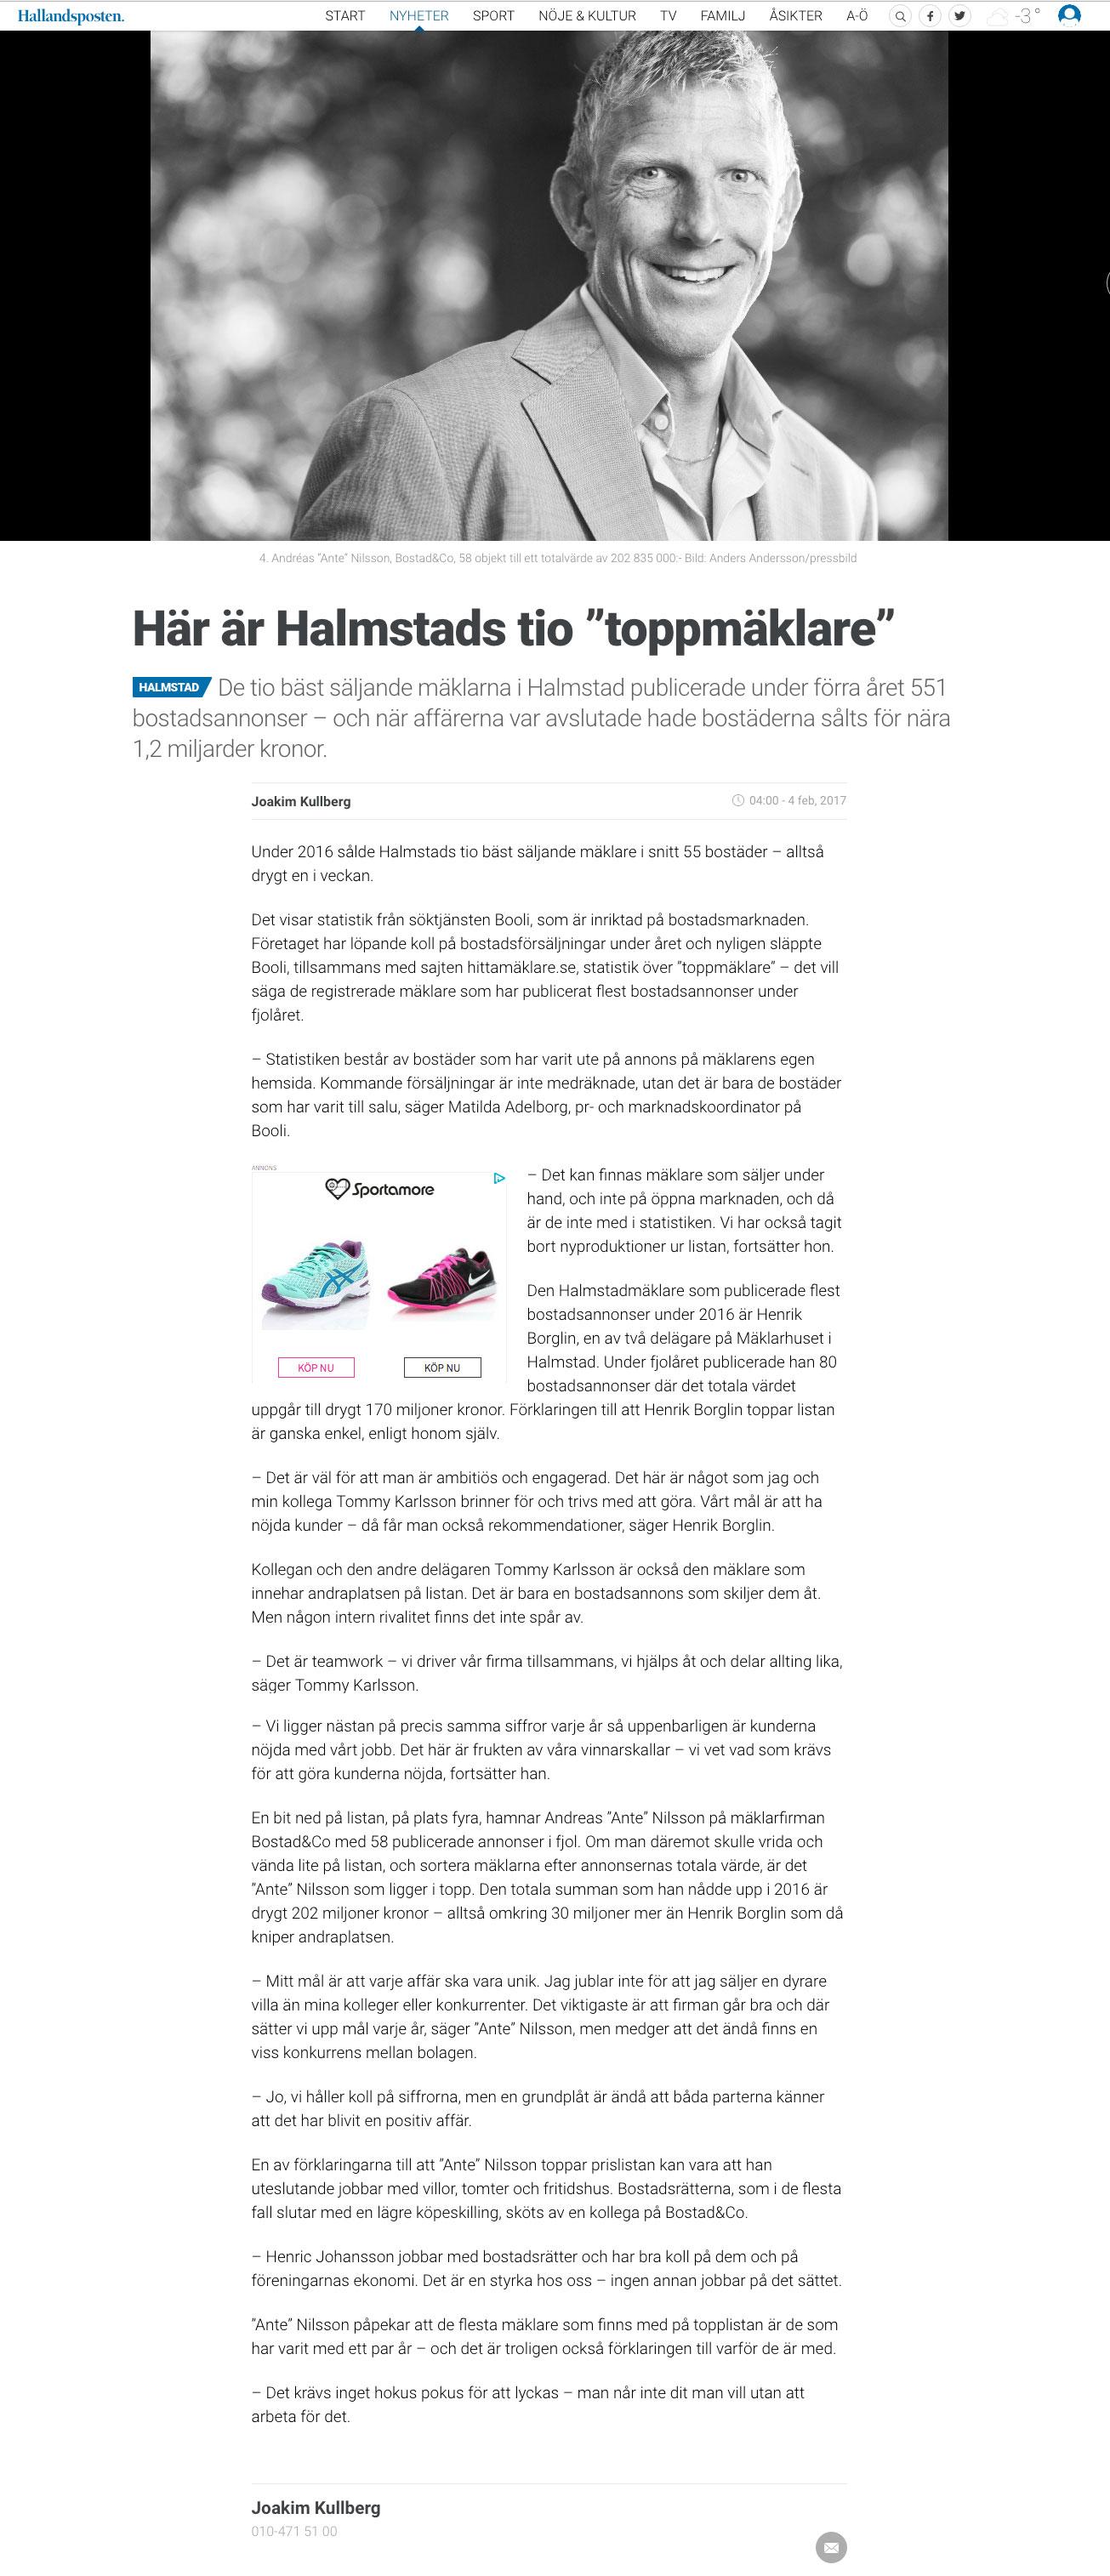 Mrtvgen 70 Hallands ln, Halmstad - satisfaction-survey.net